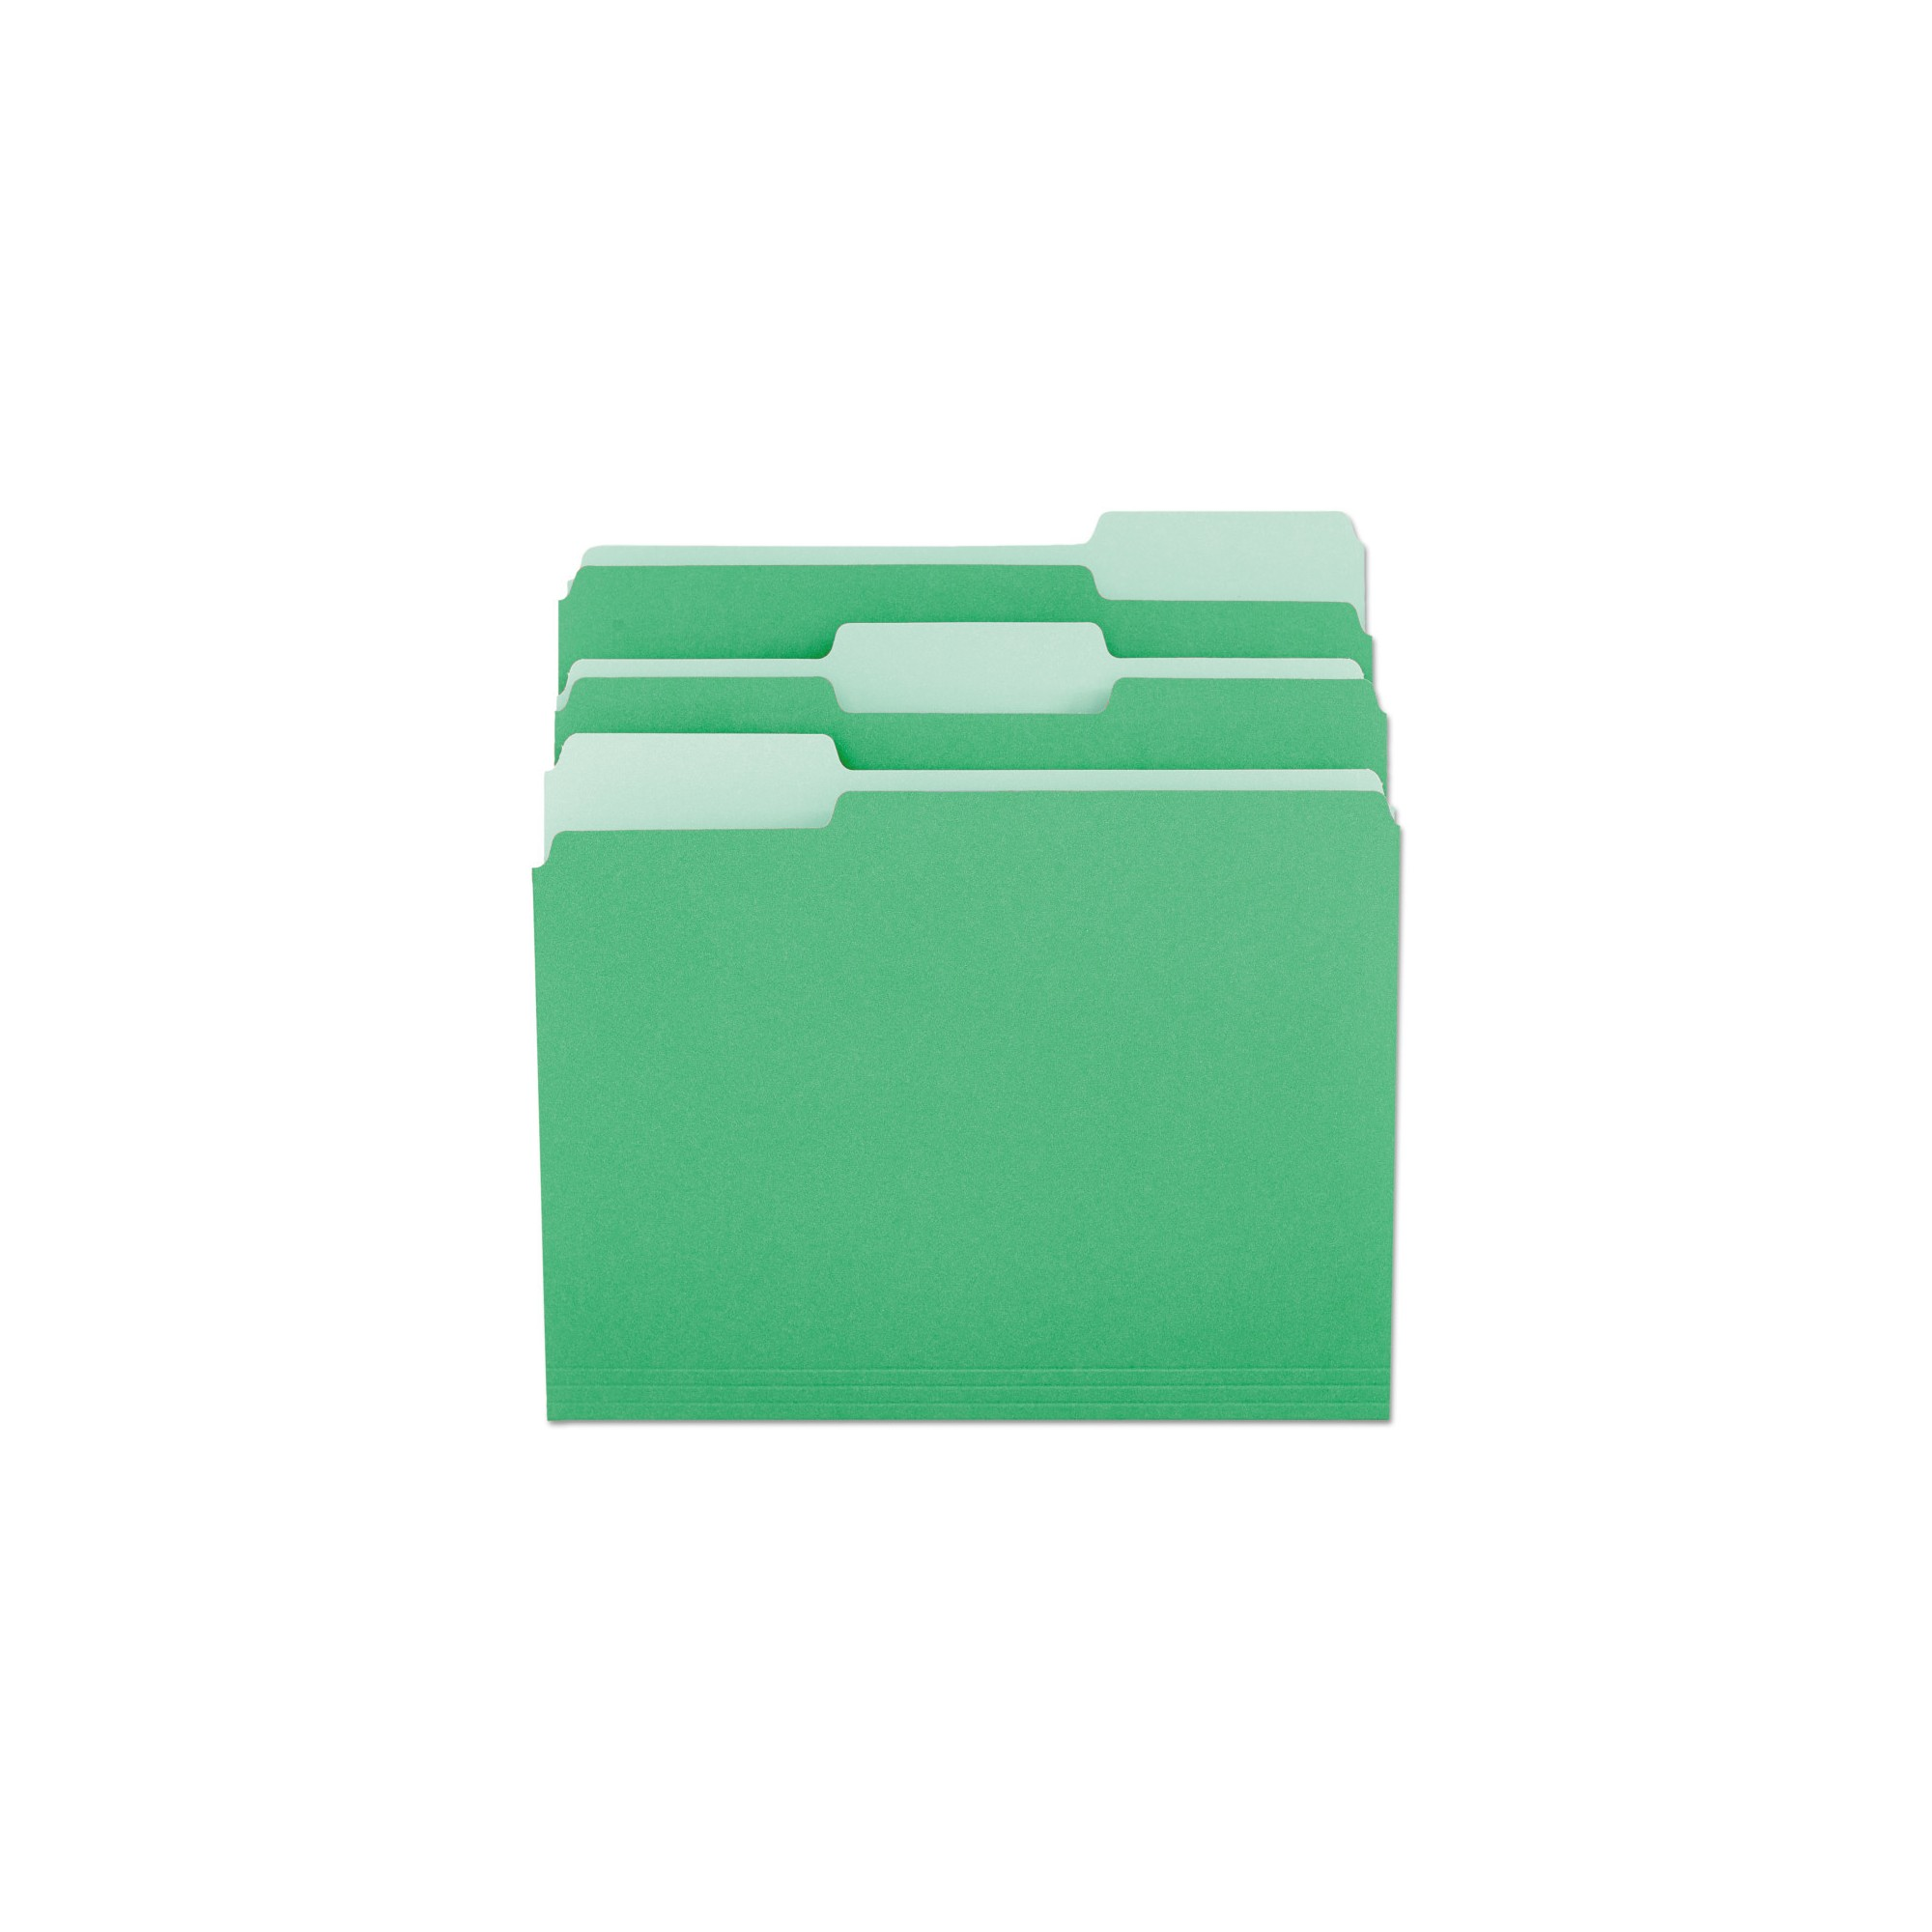 Universal File Folders, 1/3 Cut One-Ply Tab, Letter, Green/Light Green, 100/Box